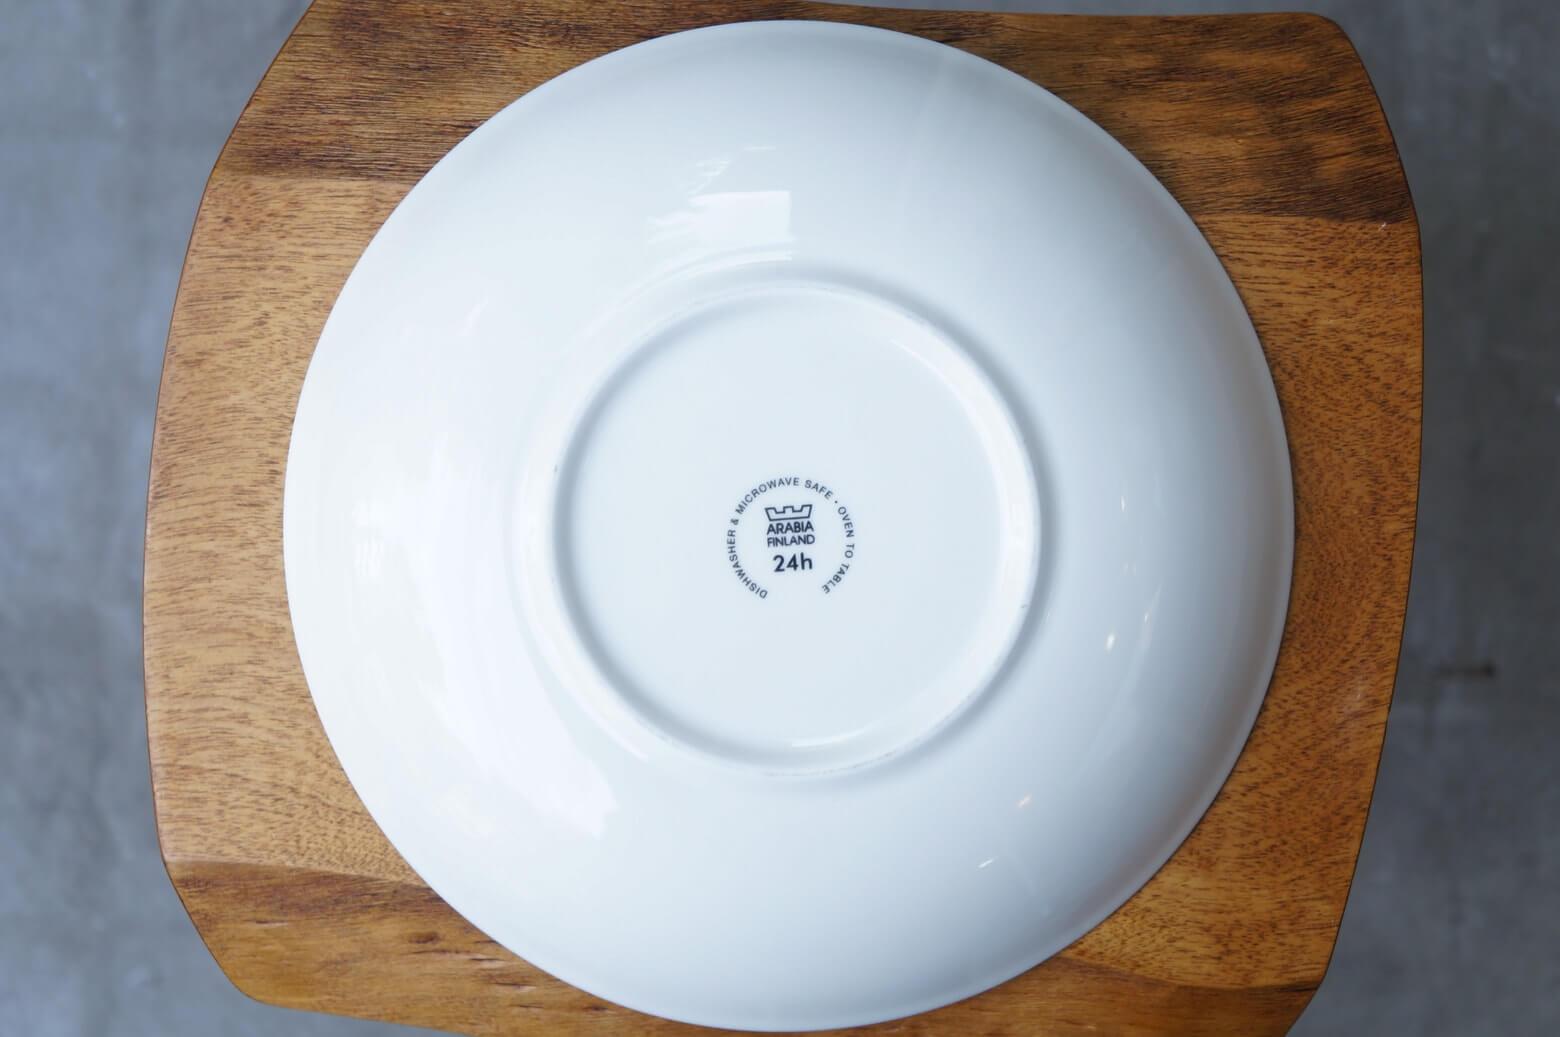 ARABIA 24h Avec Pasta Plate 24cm/アラビア 24h アベック パスタプレート 24cm 1